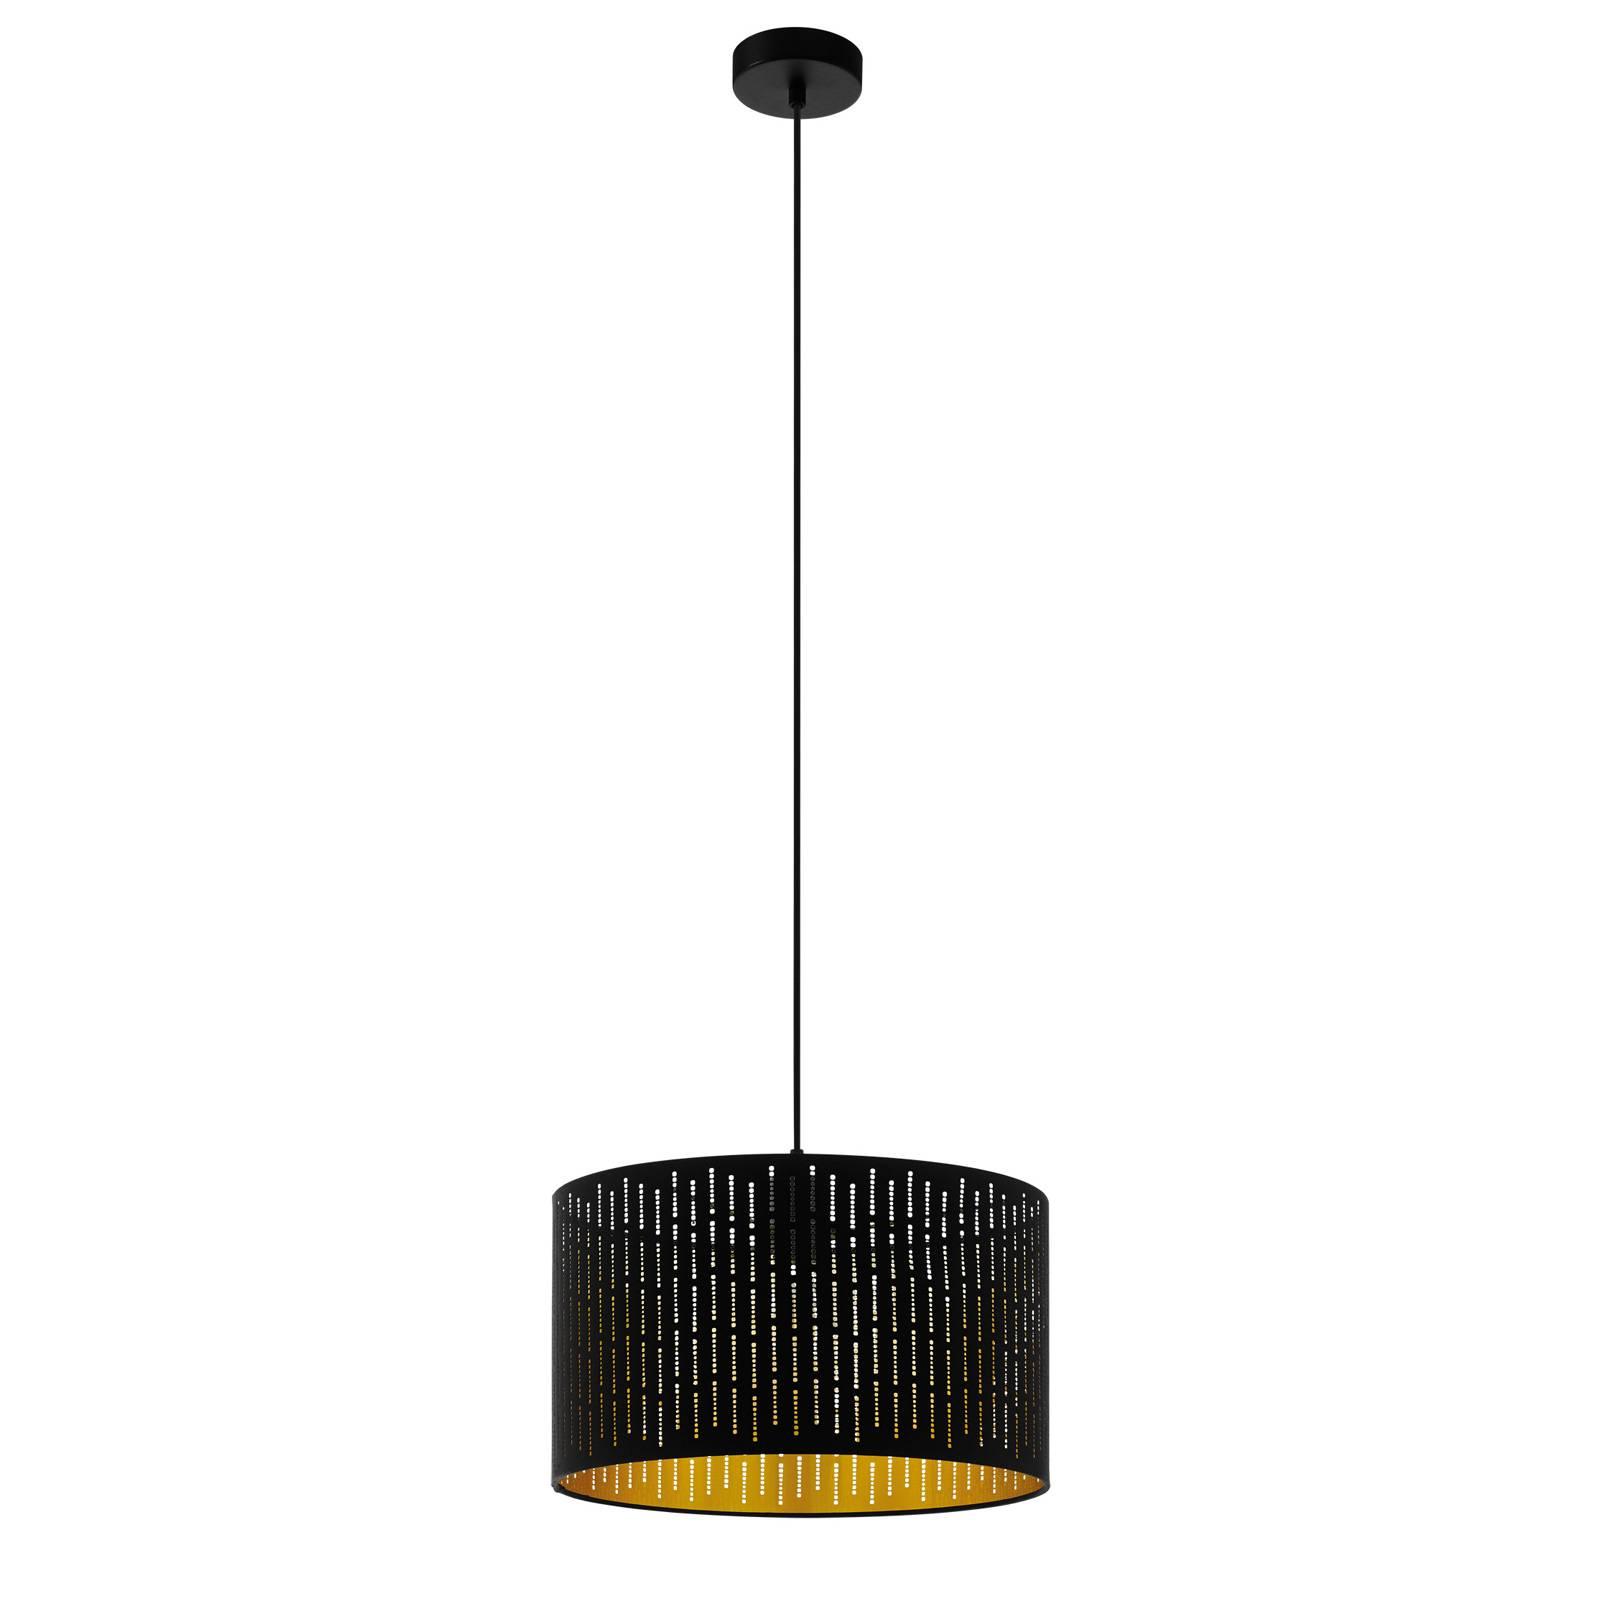 Hanglamp Varillas in zwart/goud, 38 cm